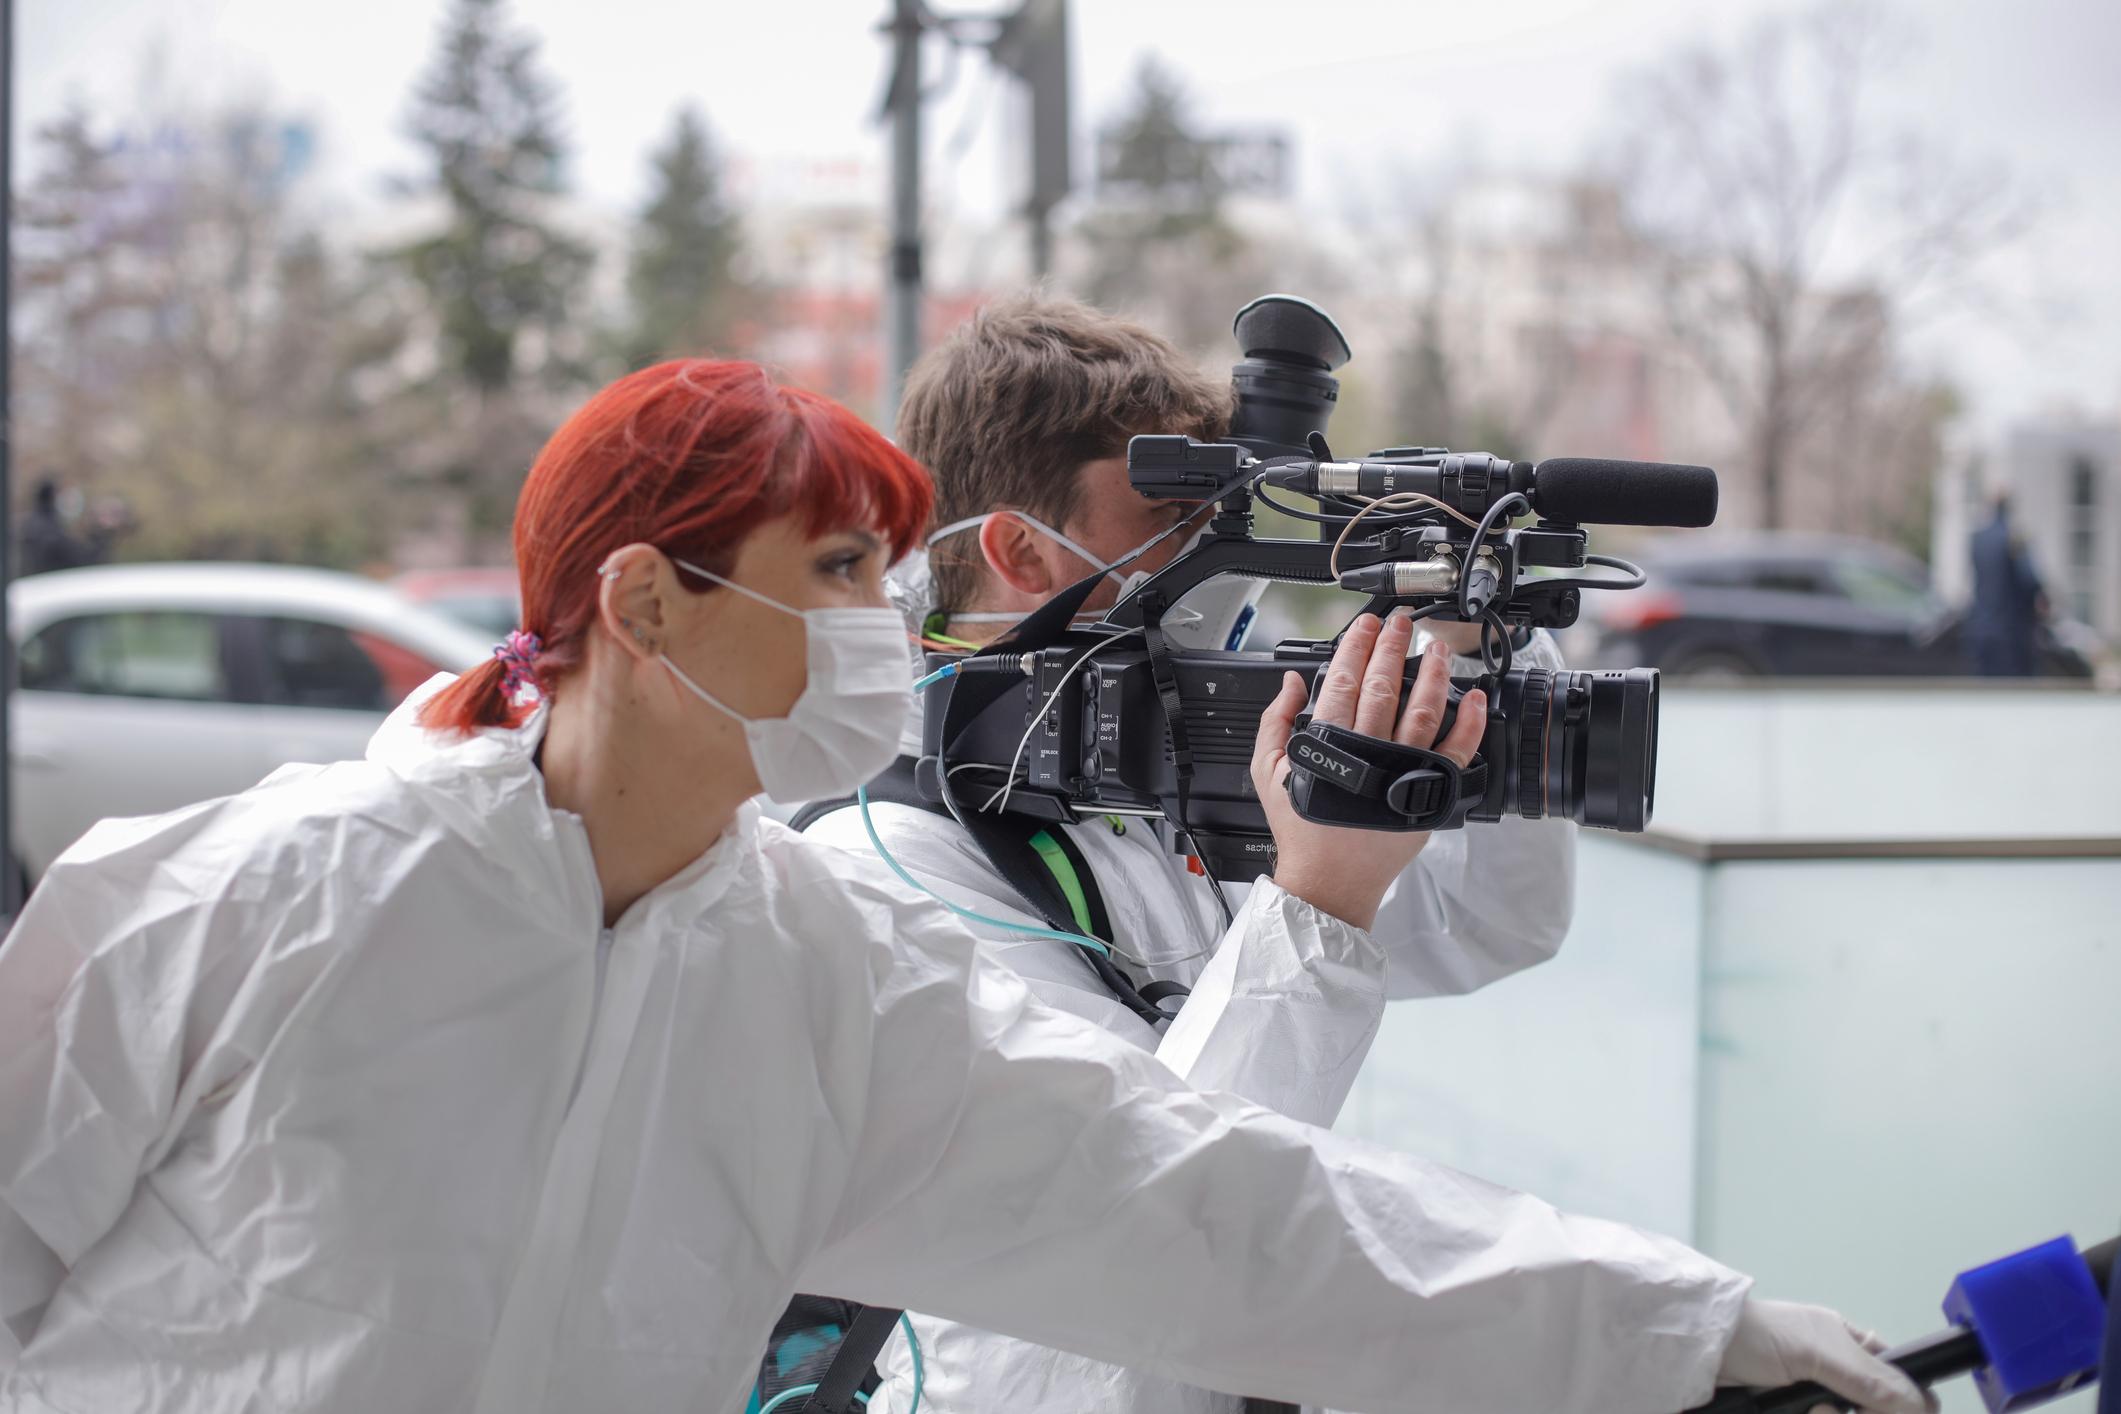 Journalists brave danger to report on coronavirus | Penn Today